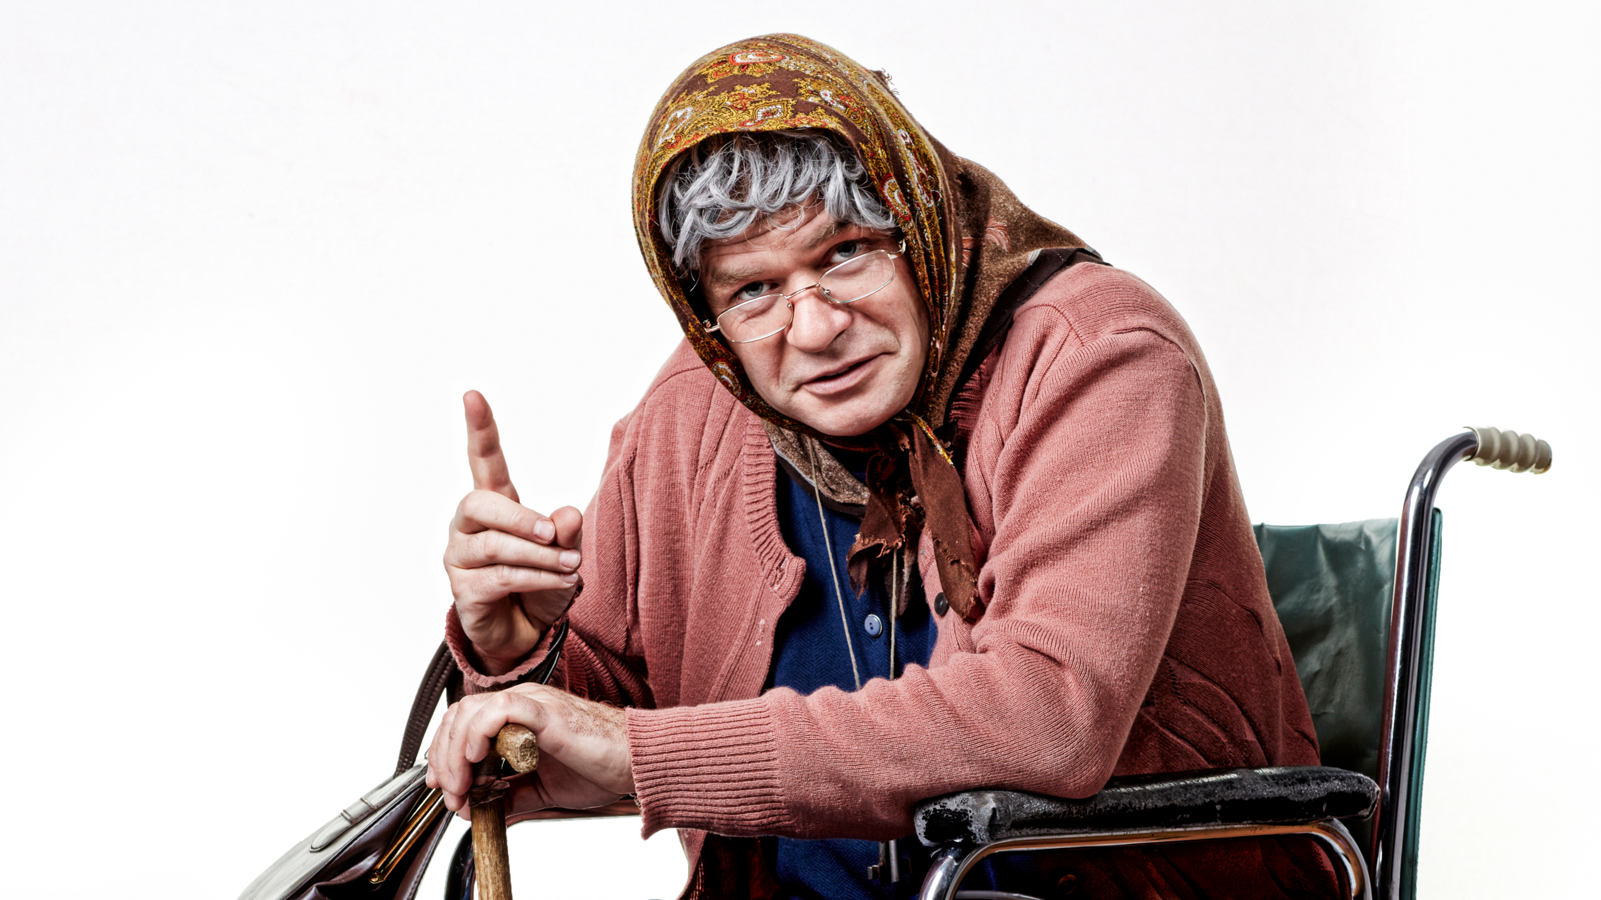 Markus Hirtler als Ermi Oma